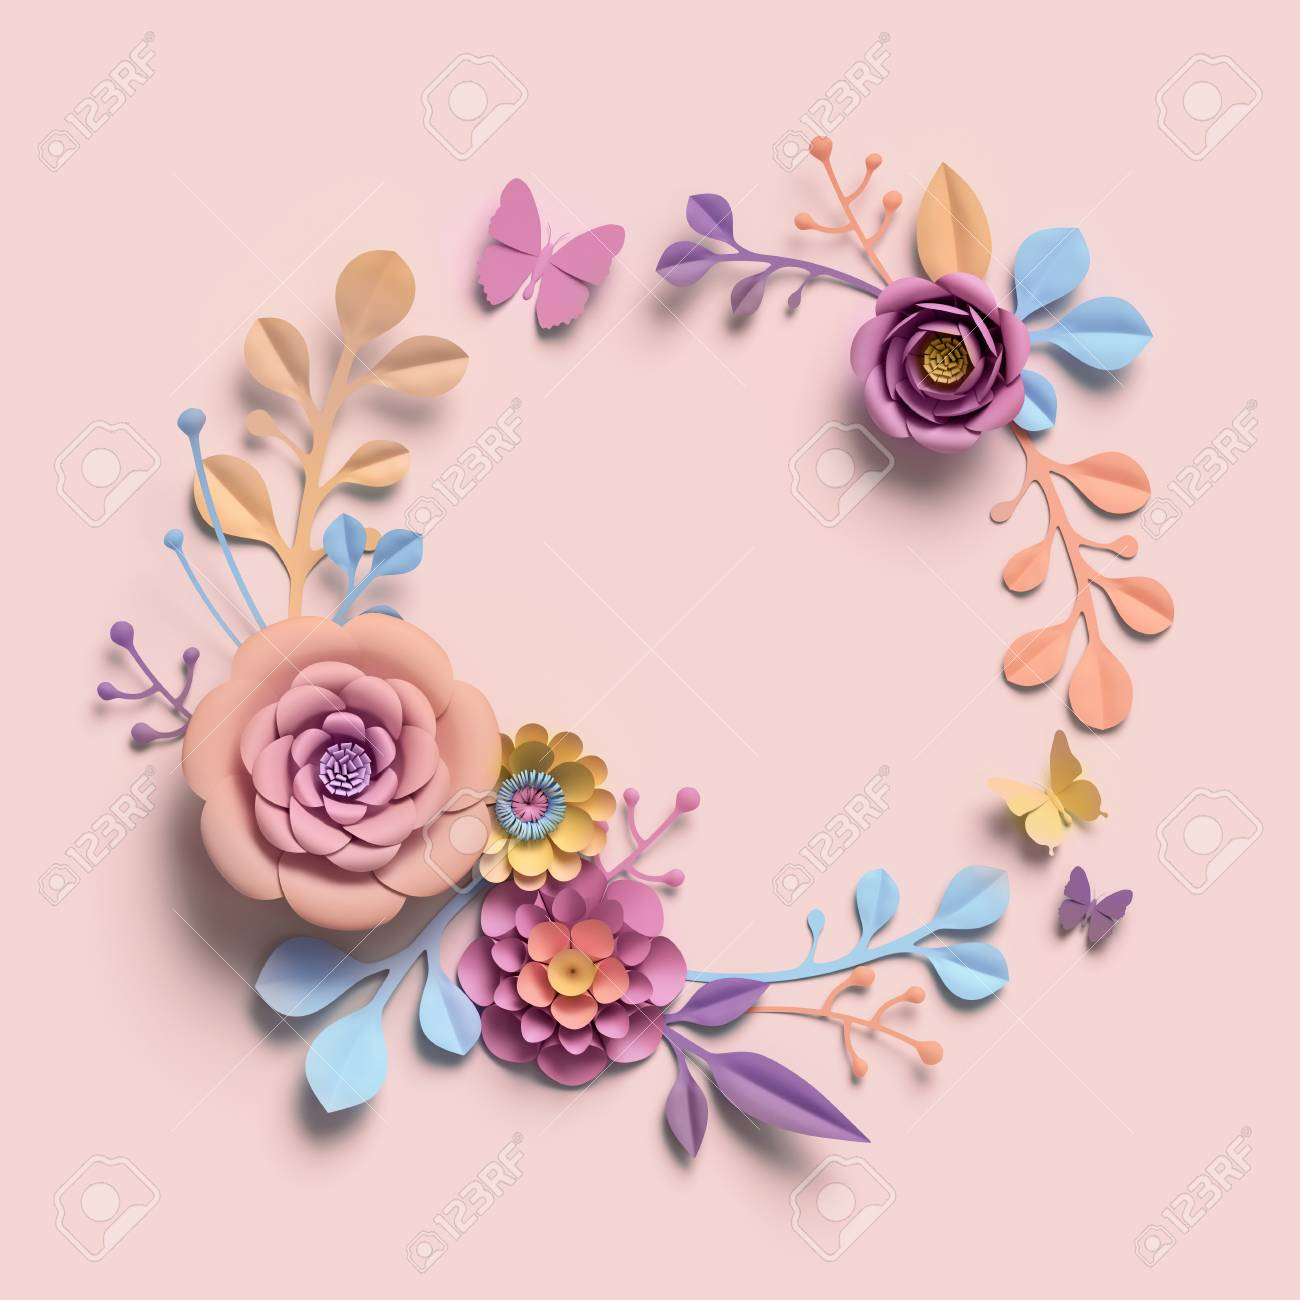 3d Rendering Paper Flowers Pastel Color Palette Botanical Stock